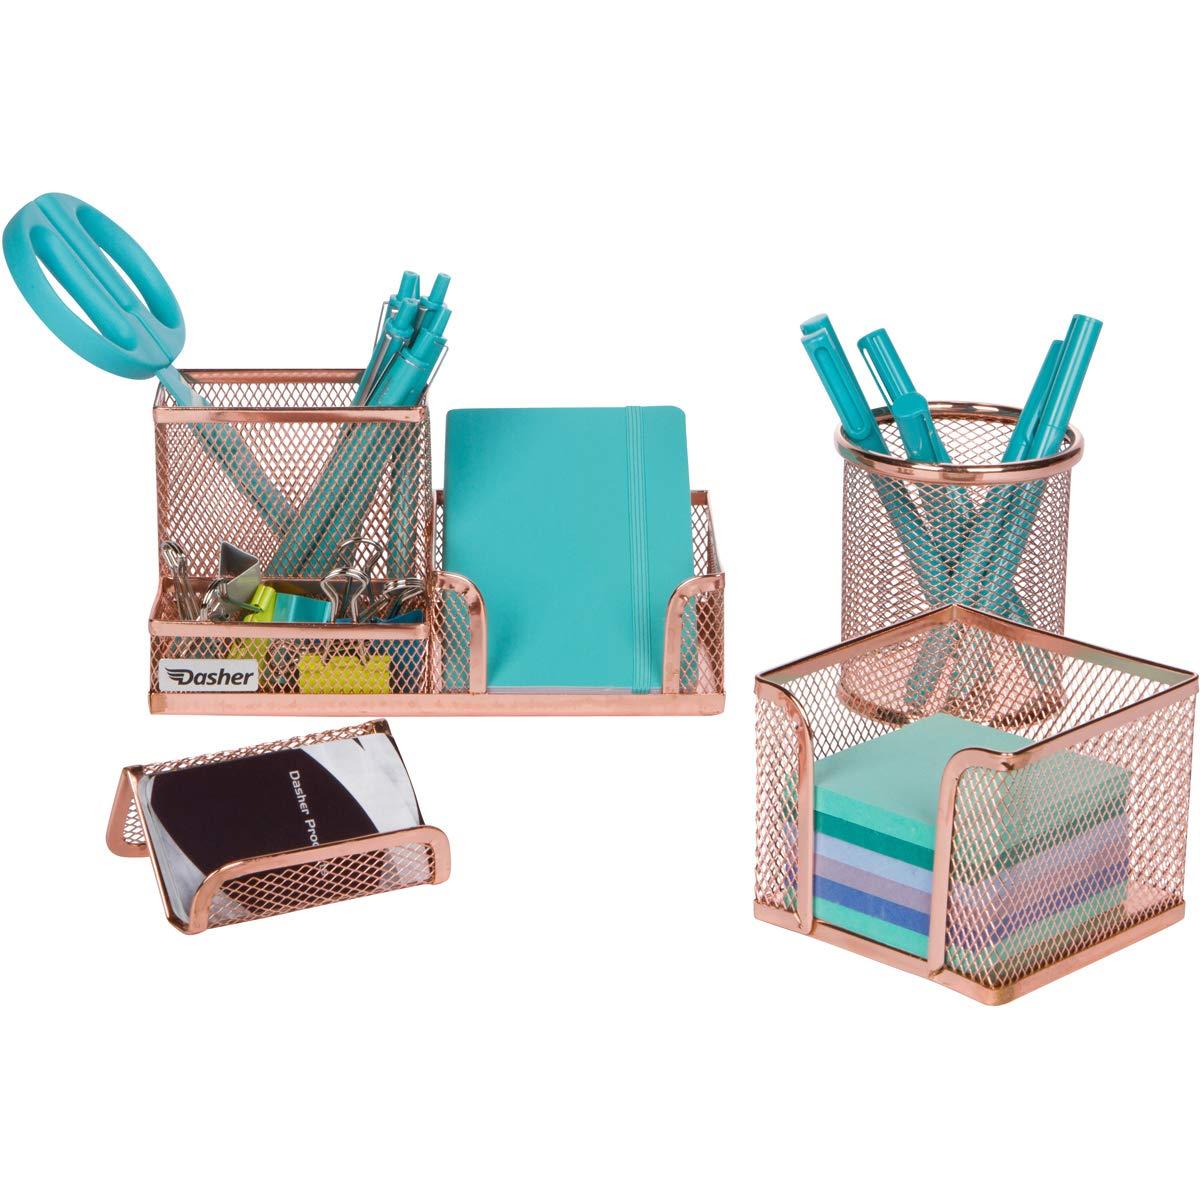 Desk Organizer Office Accessories Set - Set of 4 Rose Gold Desk Accessories, Mesh Desk Set Includes Pen Case, Sticky Note Holder, Business Card Tray, and Desk Organizer